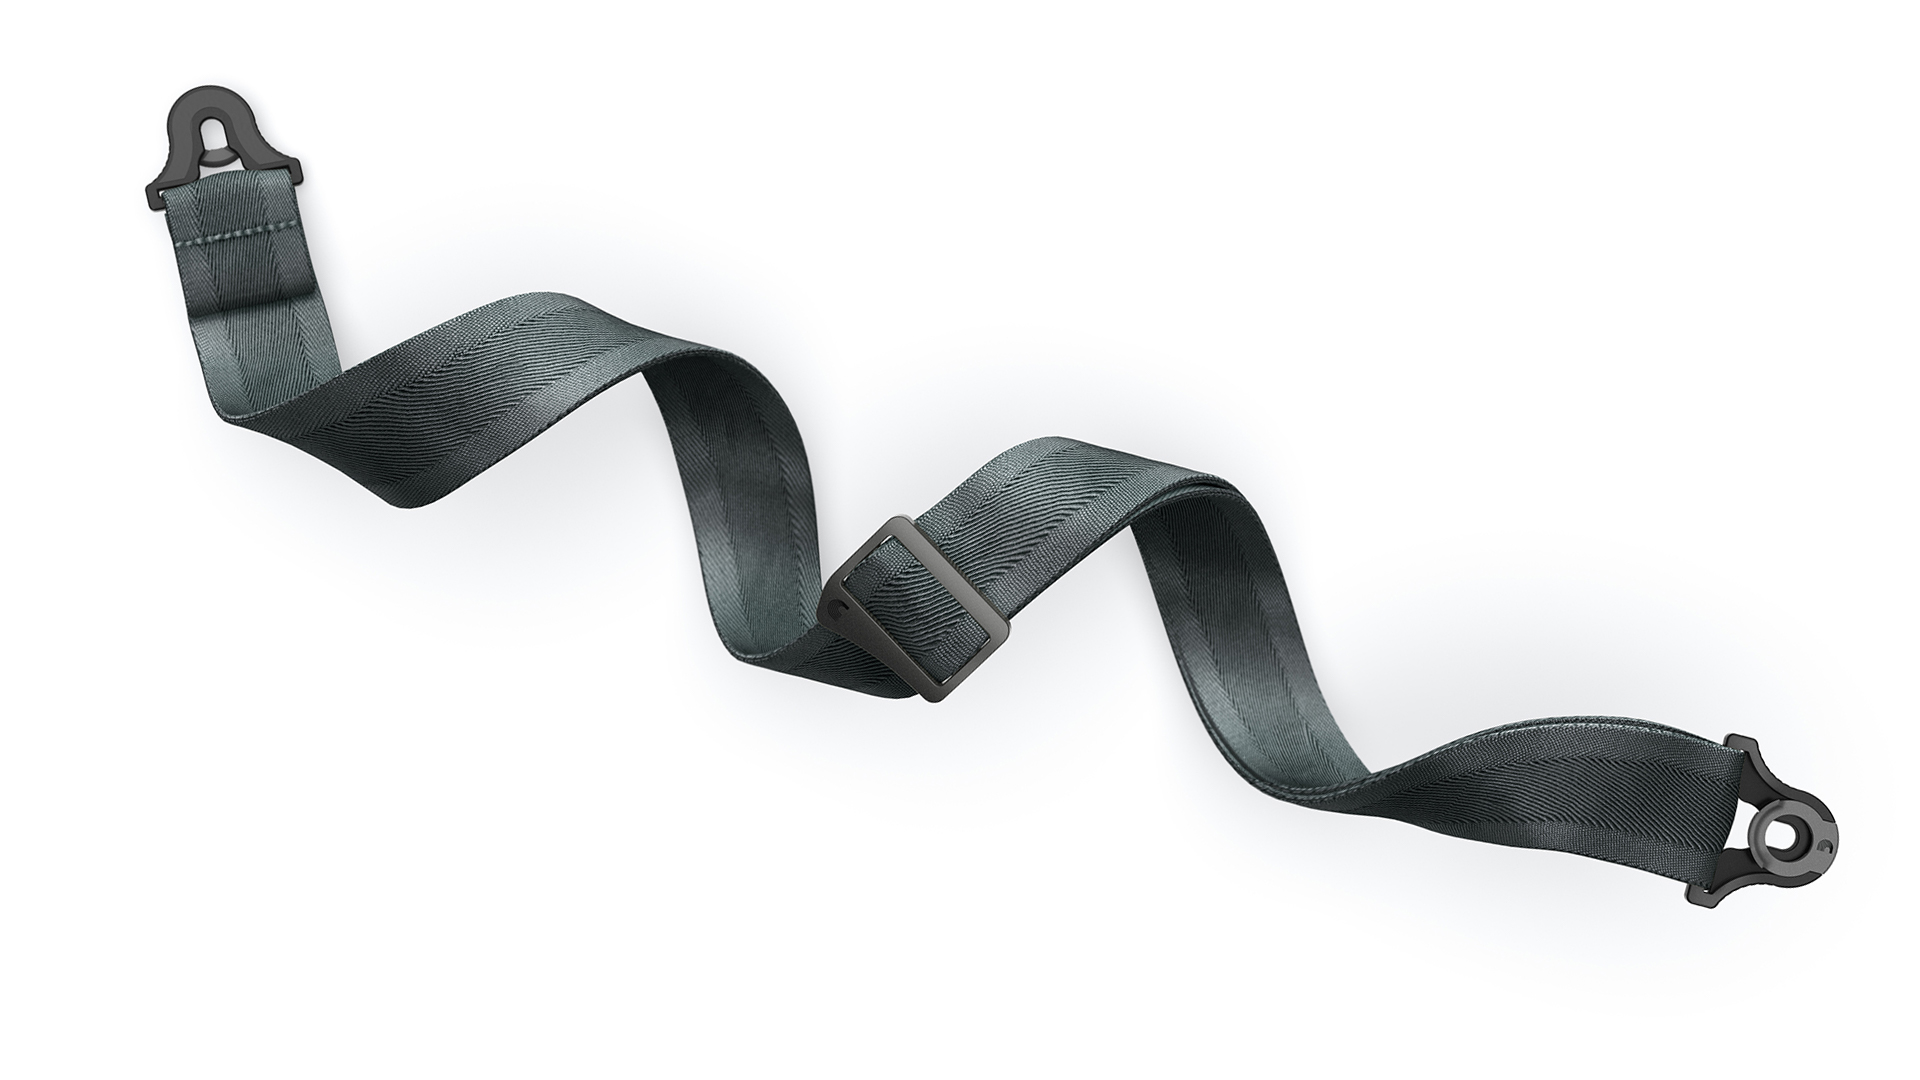 D'Addario Guitar Strap Lock Grey Product Render